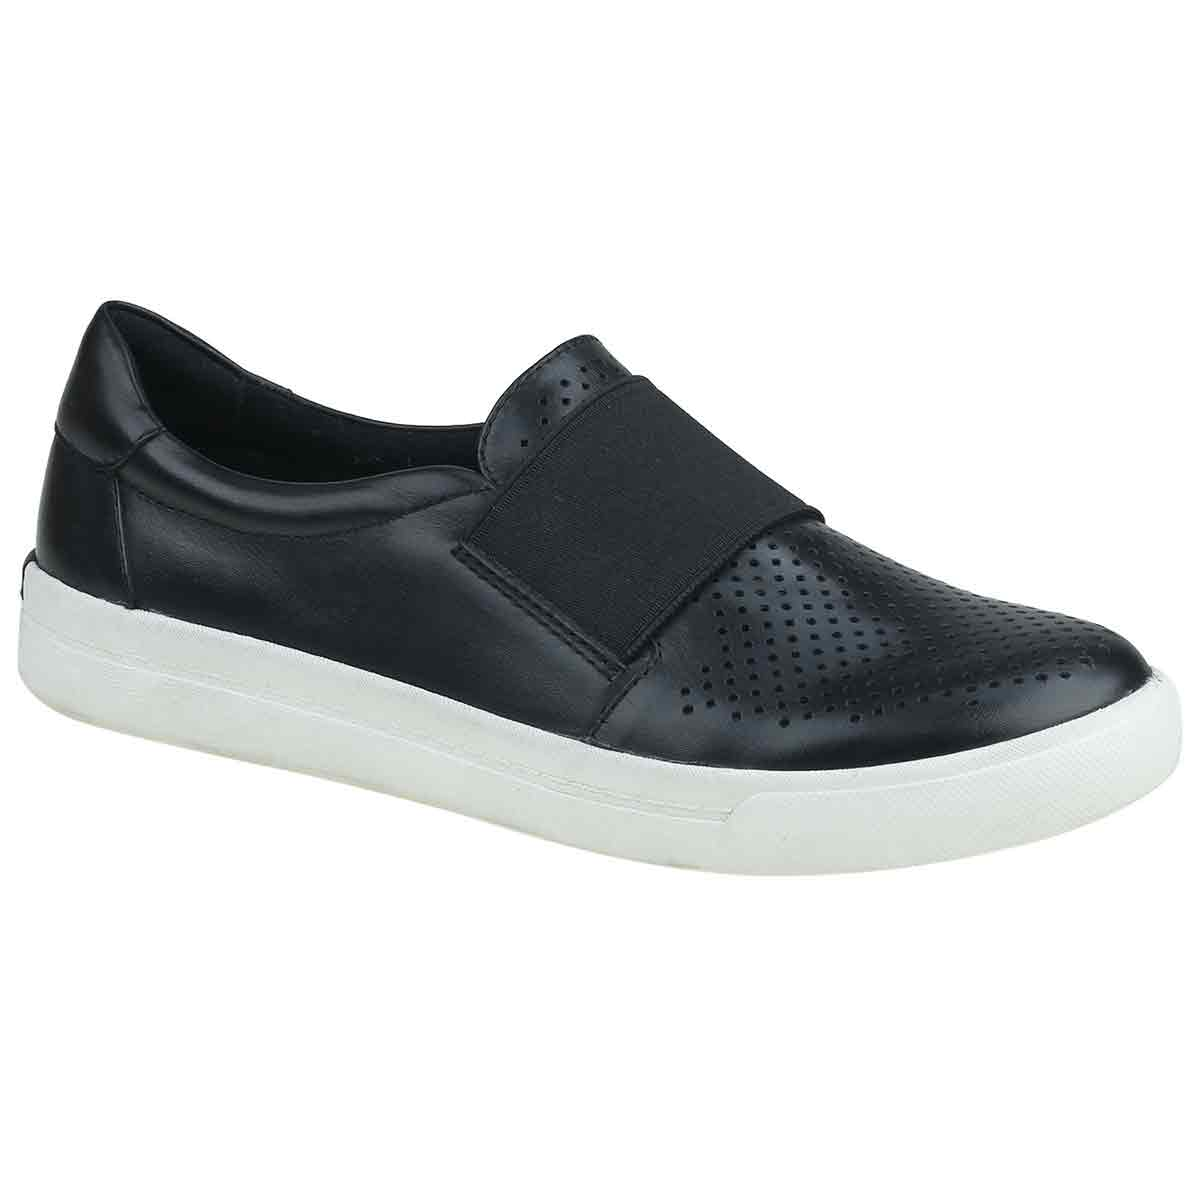 Earth Origins Women's Melissa Sneakers - Black, 8.5